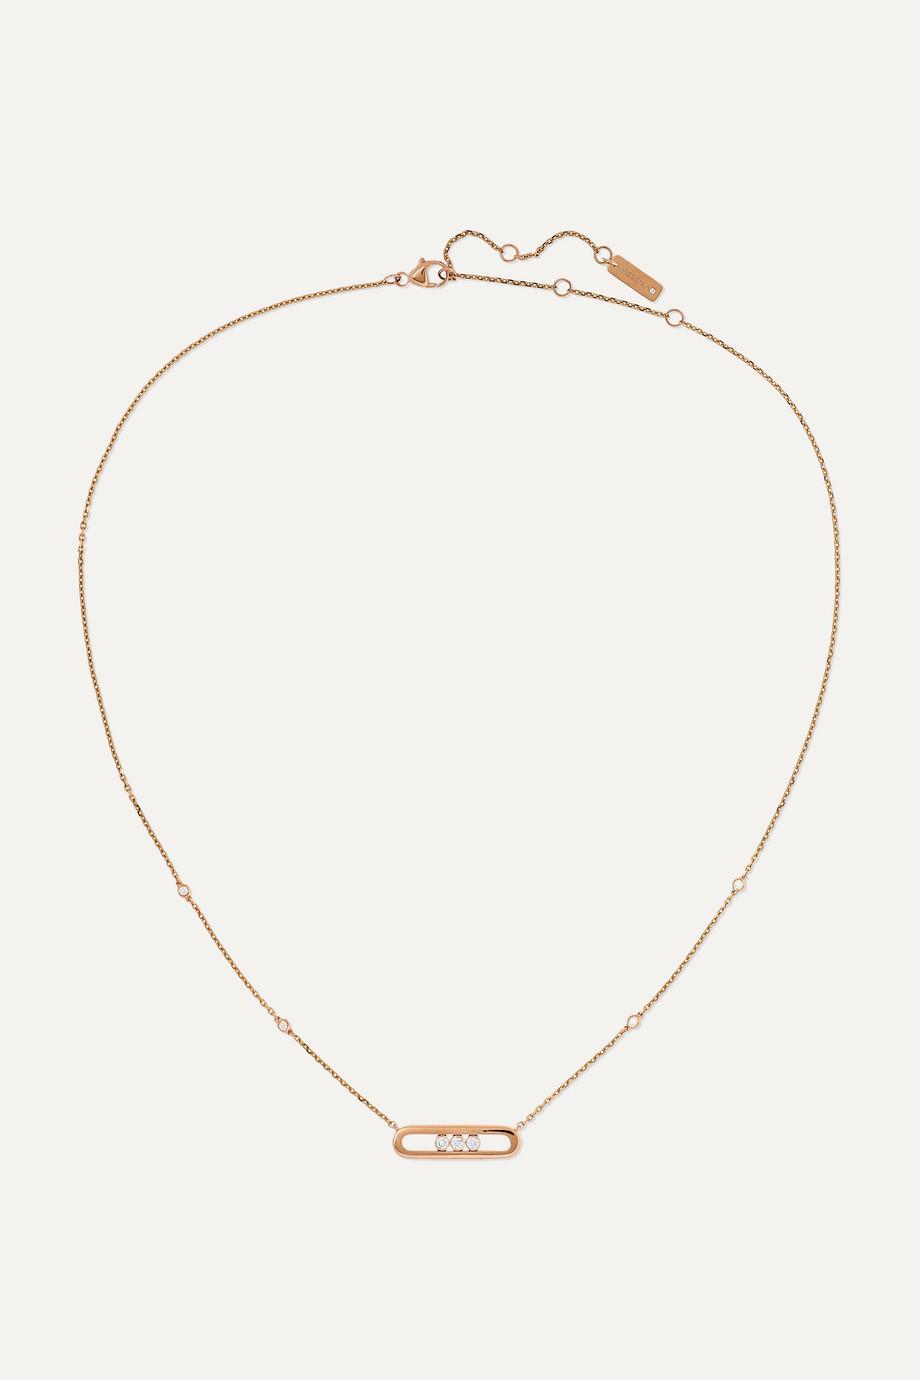 Messika Baby Move 18-karat rose gold diamond necklace